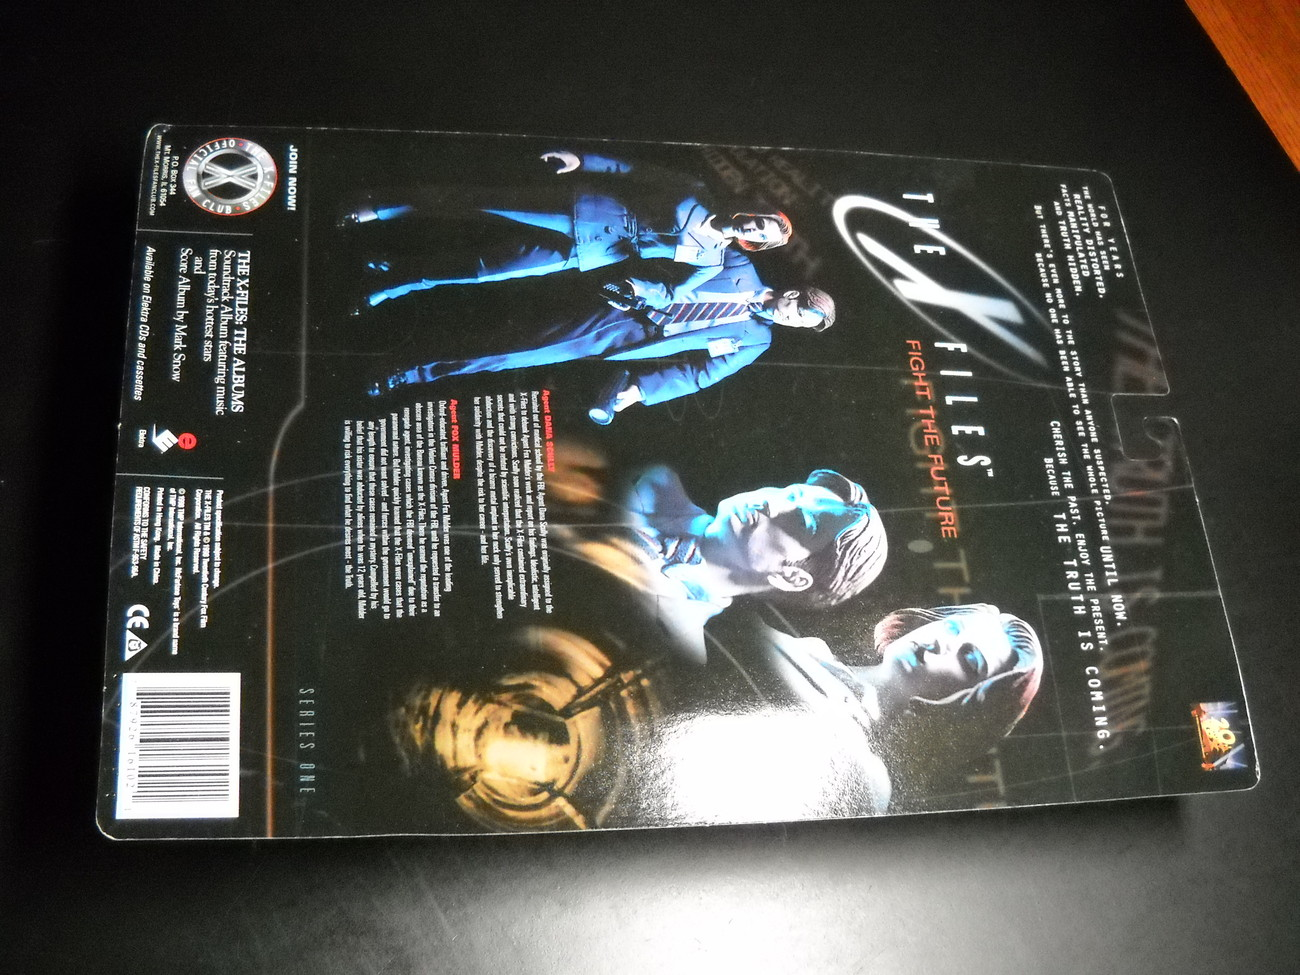 X Files McFarlane 5 1/2 Inch Dana Scully Shroud 98 Series 1 Still Sealed on Card